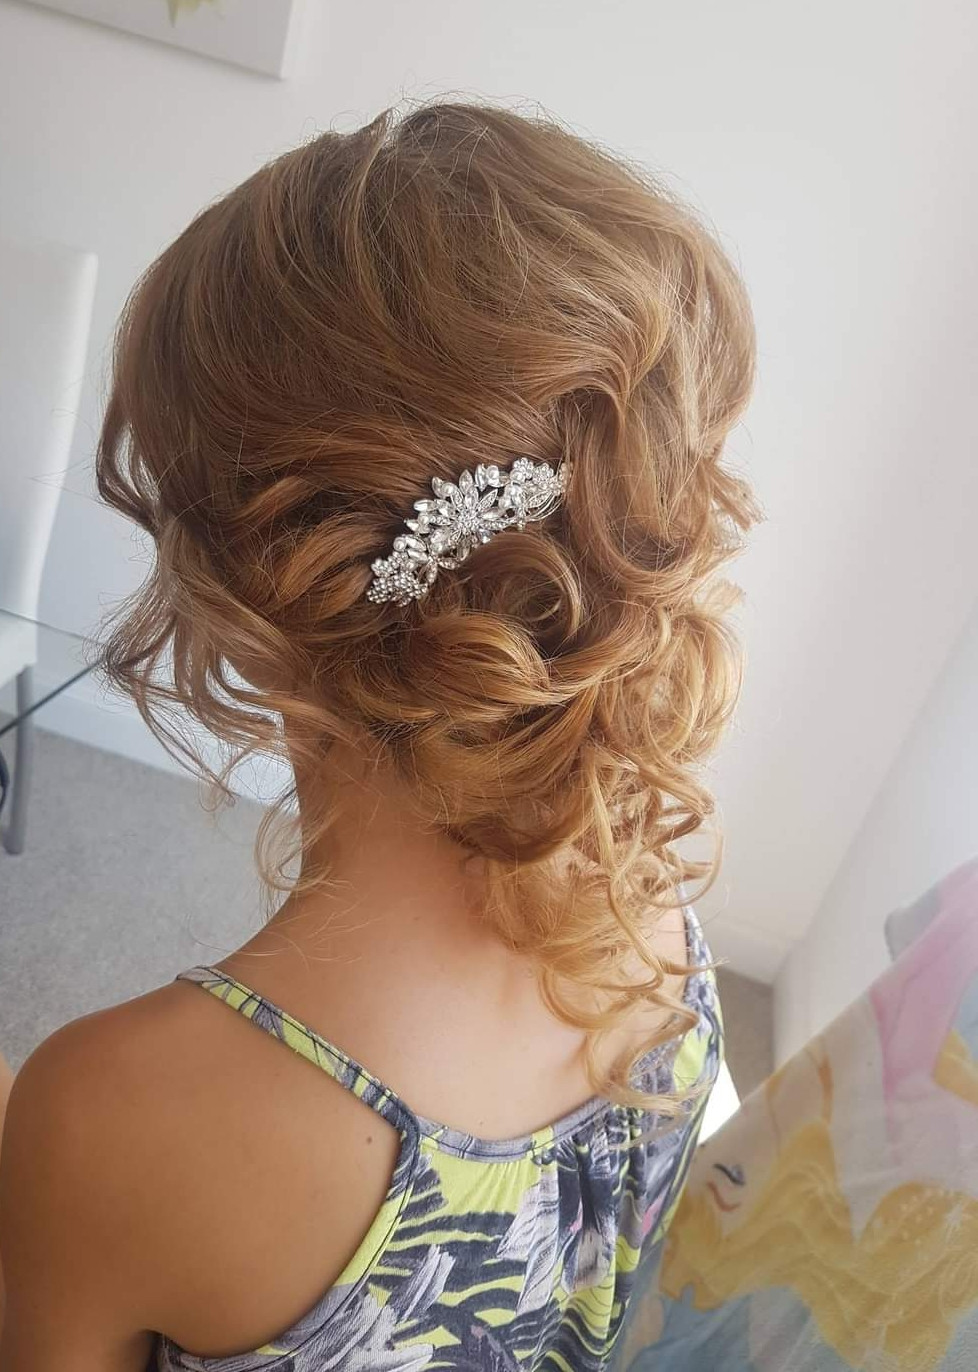 - Make Me Bridal Artist: Hair Creations North West. #curls #haircreationsnorthwest